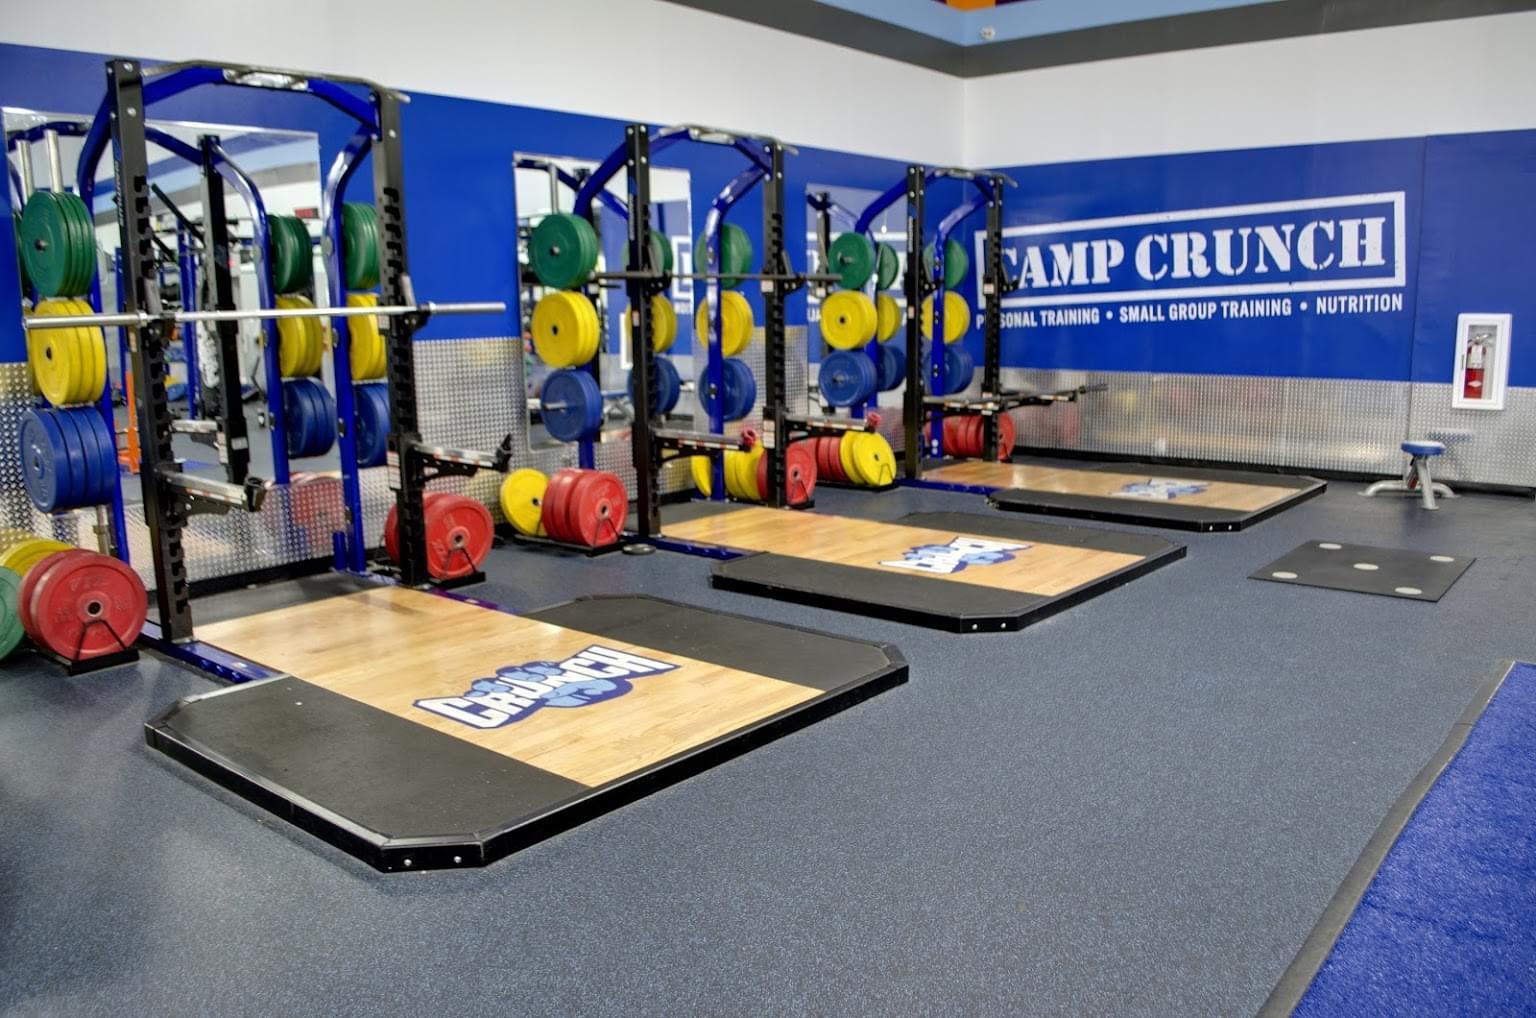 Crunch Fitness Gym in North Charleston, SC squat rack